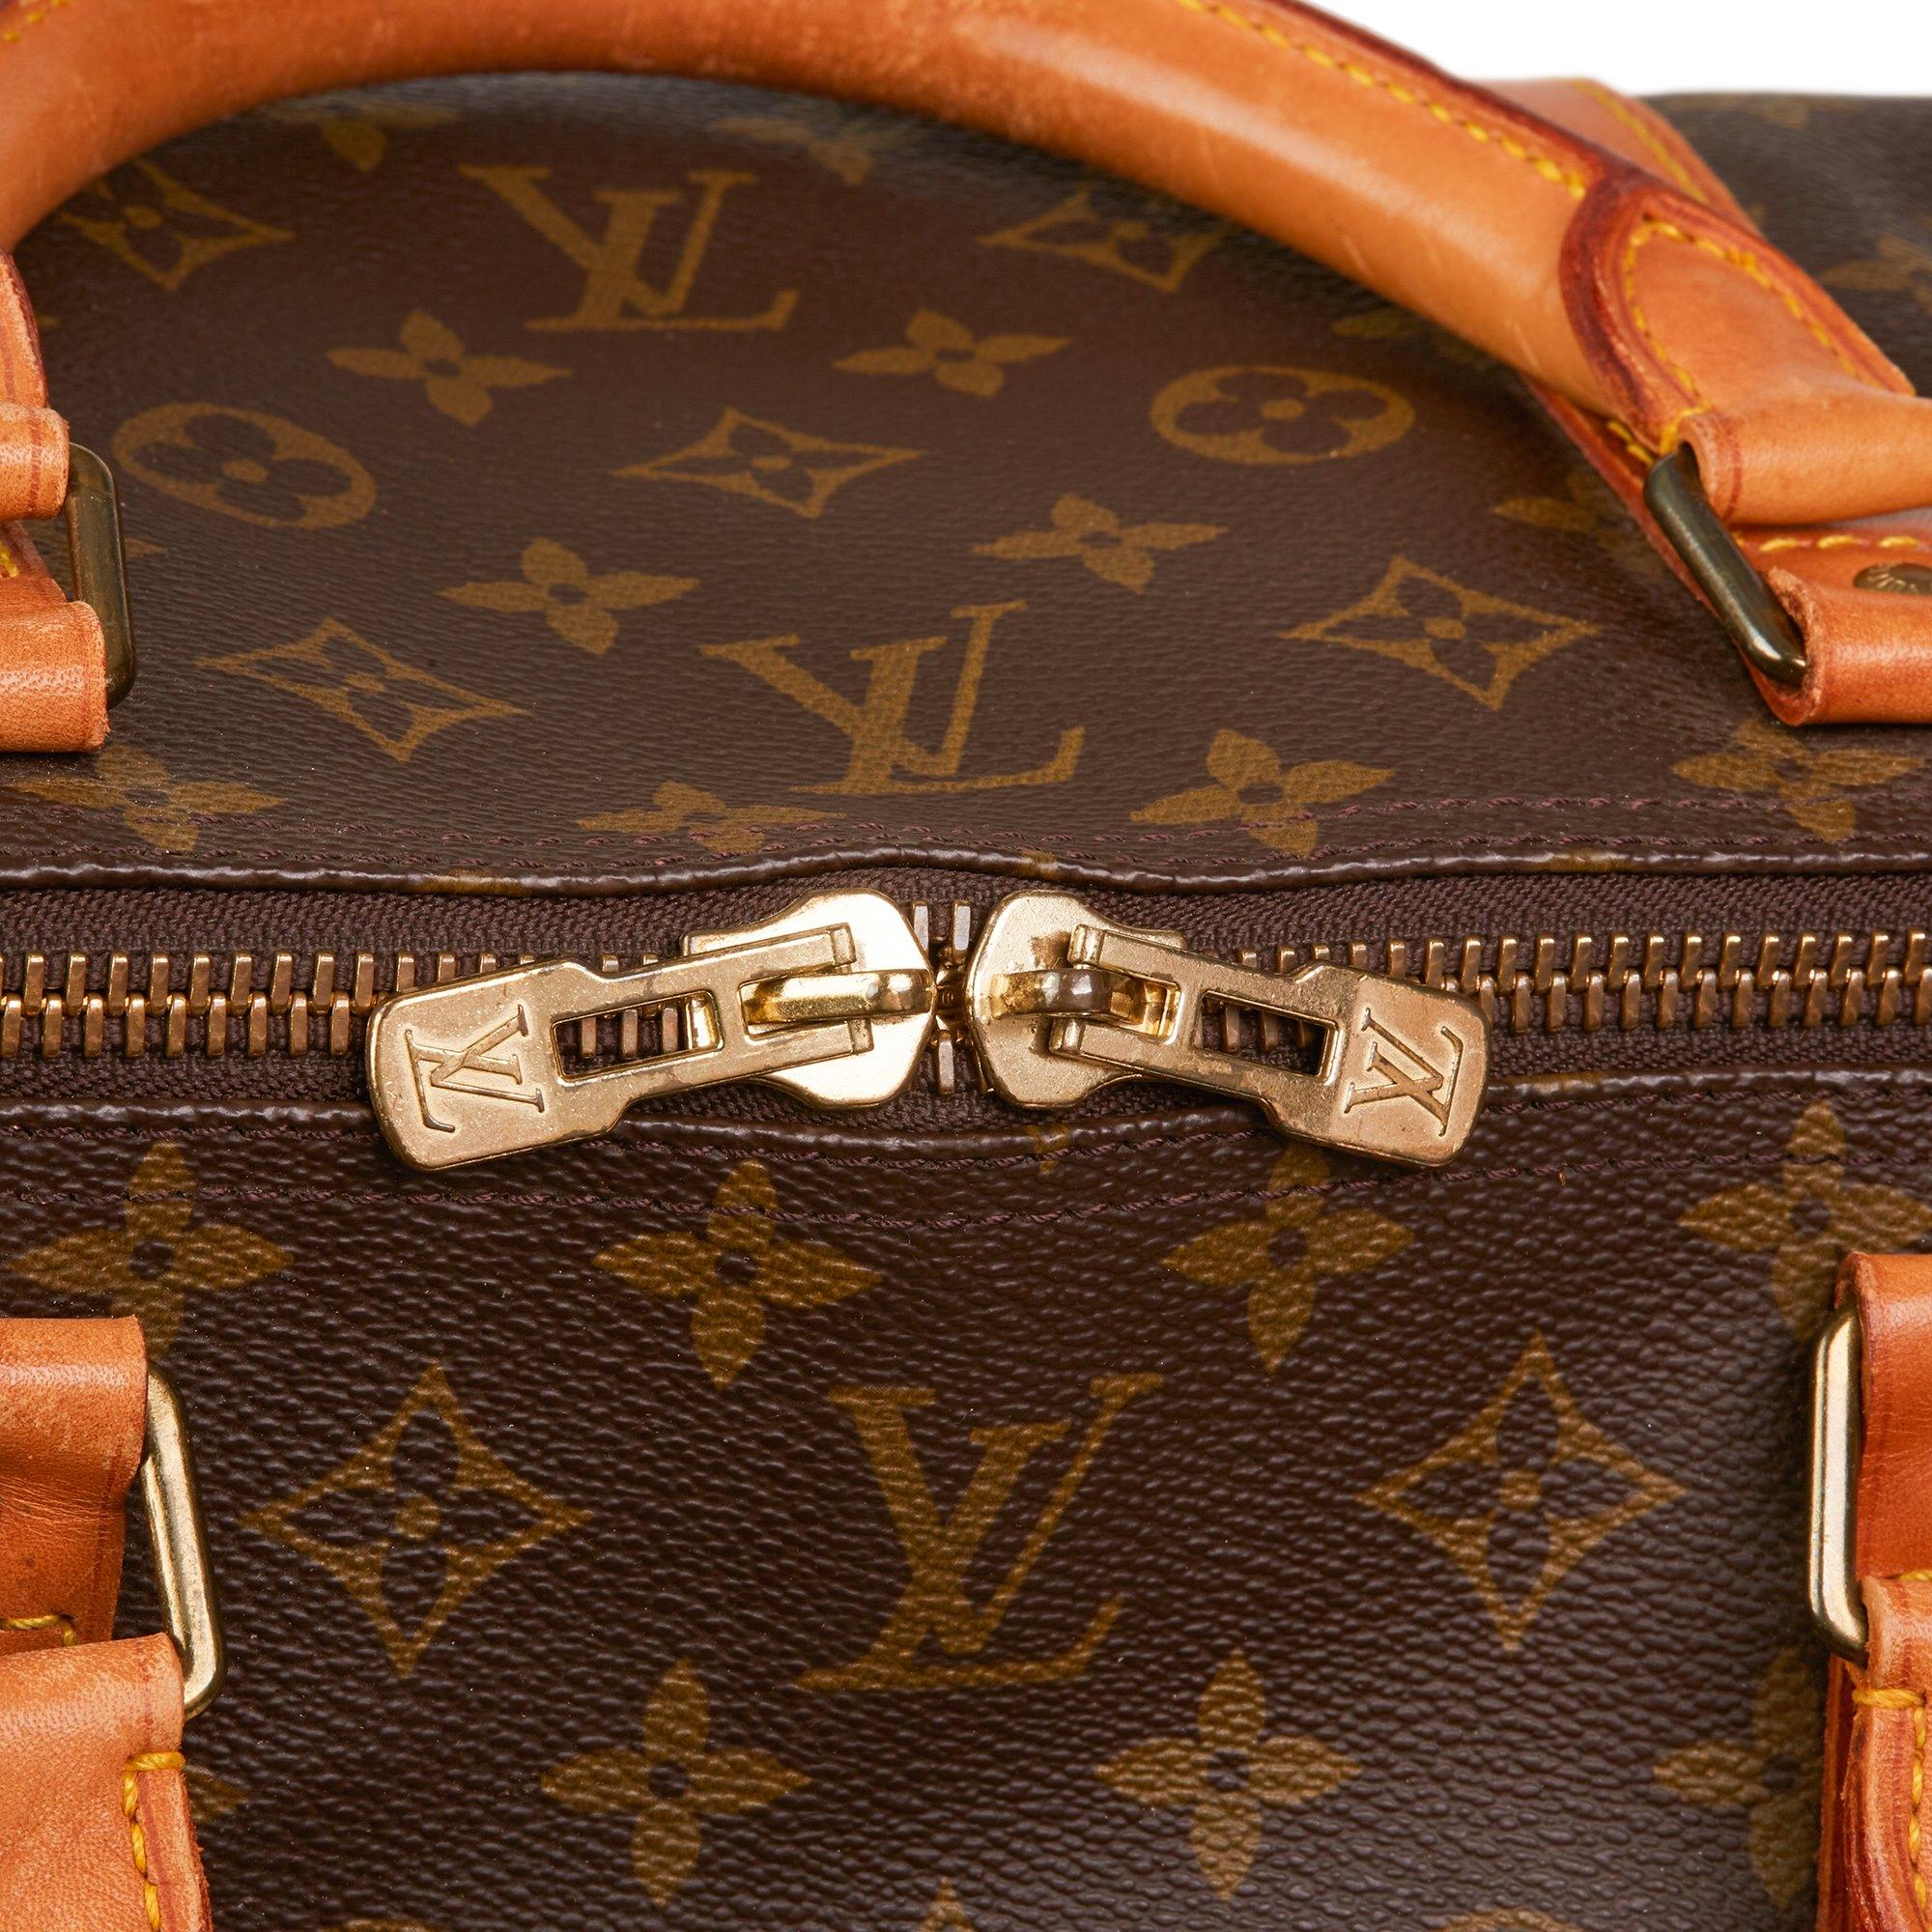 Louis Vuitton Brown Monogram Coated Canvas & Vachetta Leather Vintage Keepall 60